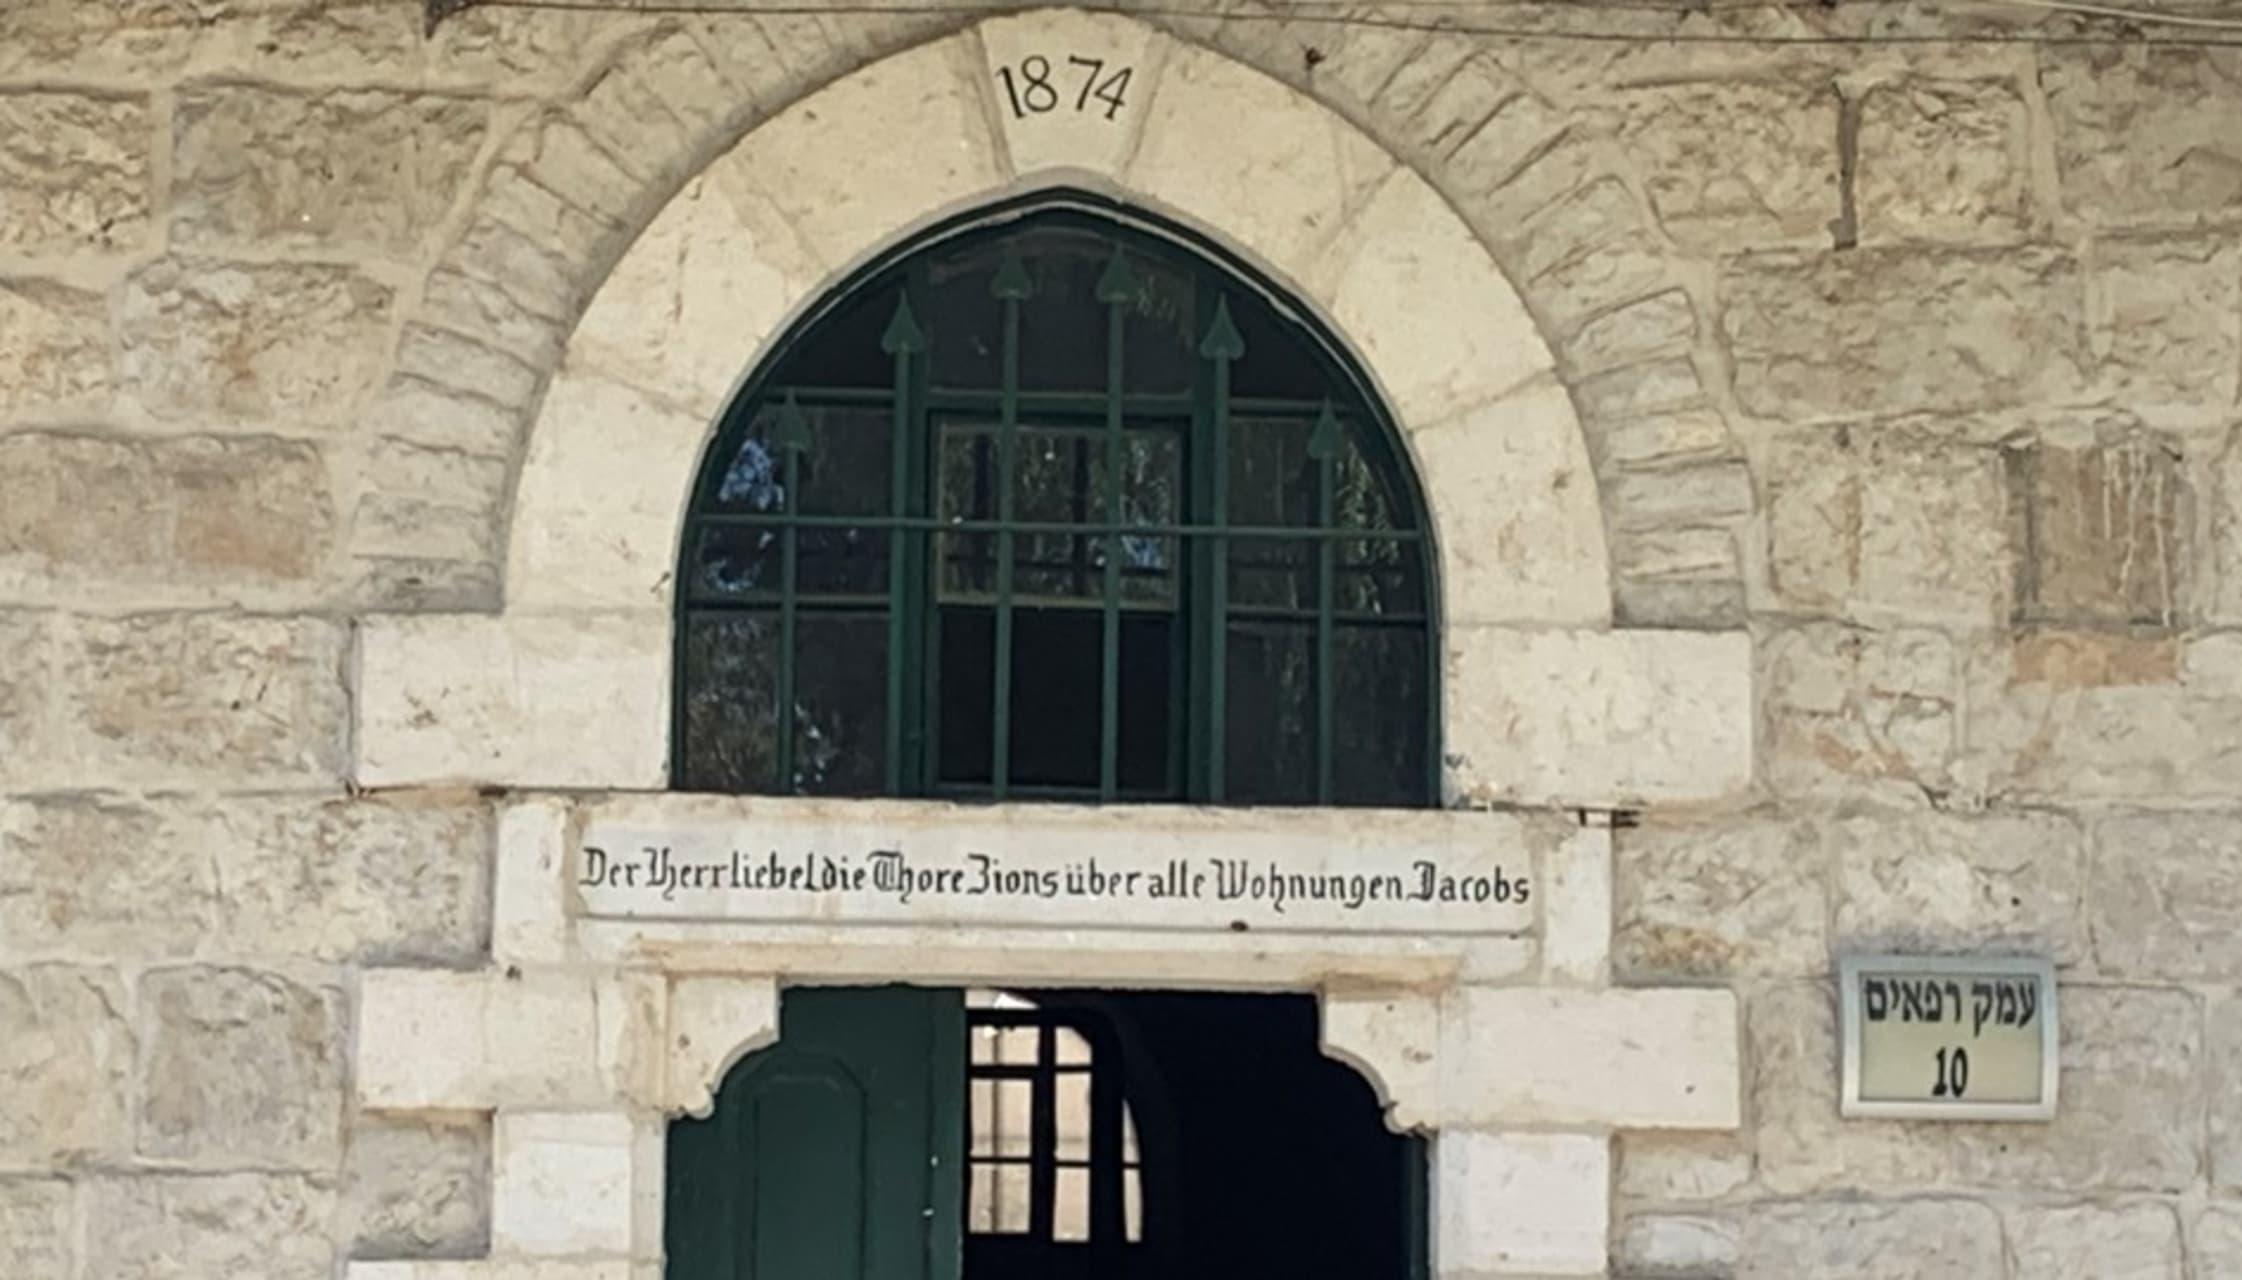 Jerusalem - The German Colony in Jerusalem - From Utopia to Nazism in the pastoral Jerusalem Colony